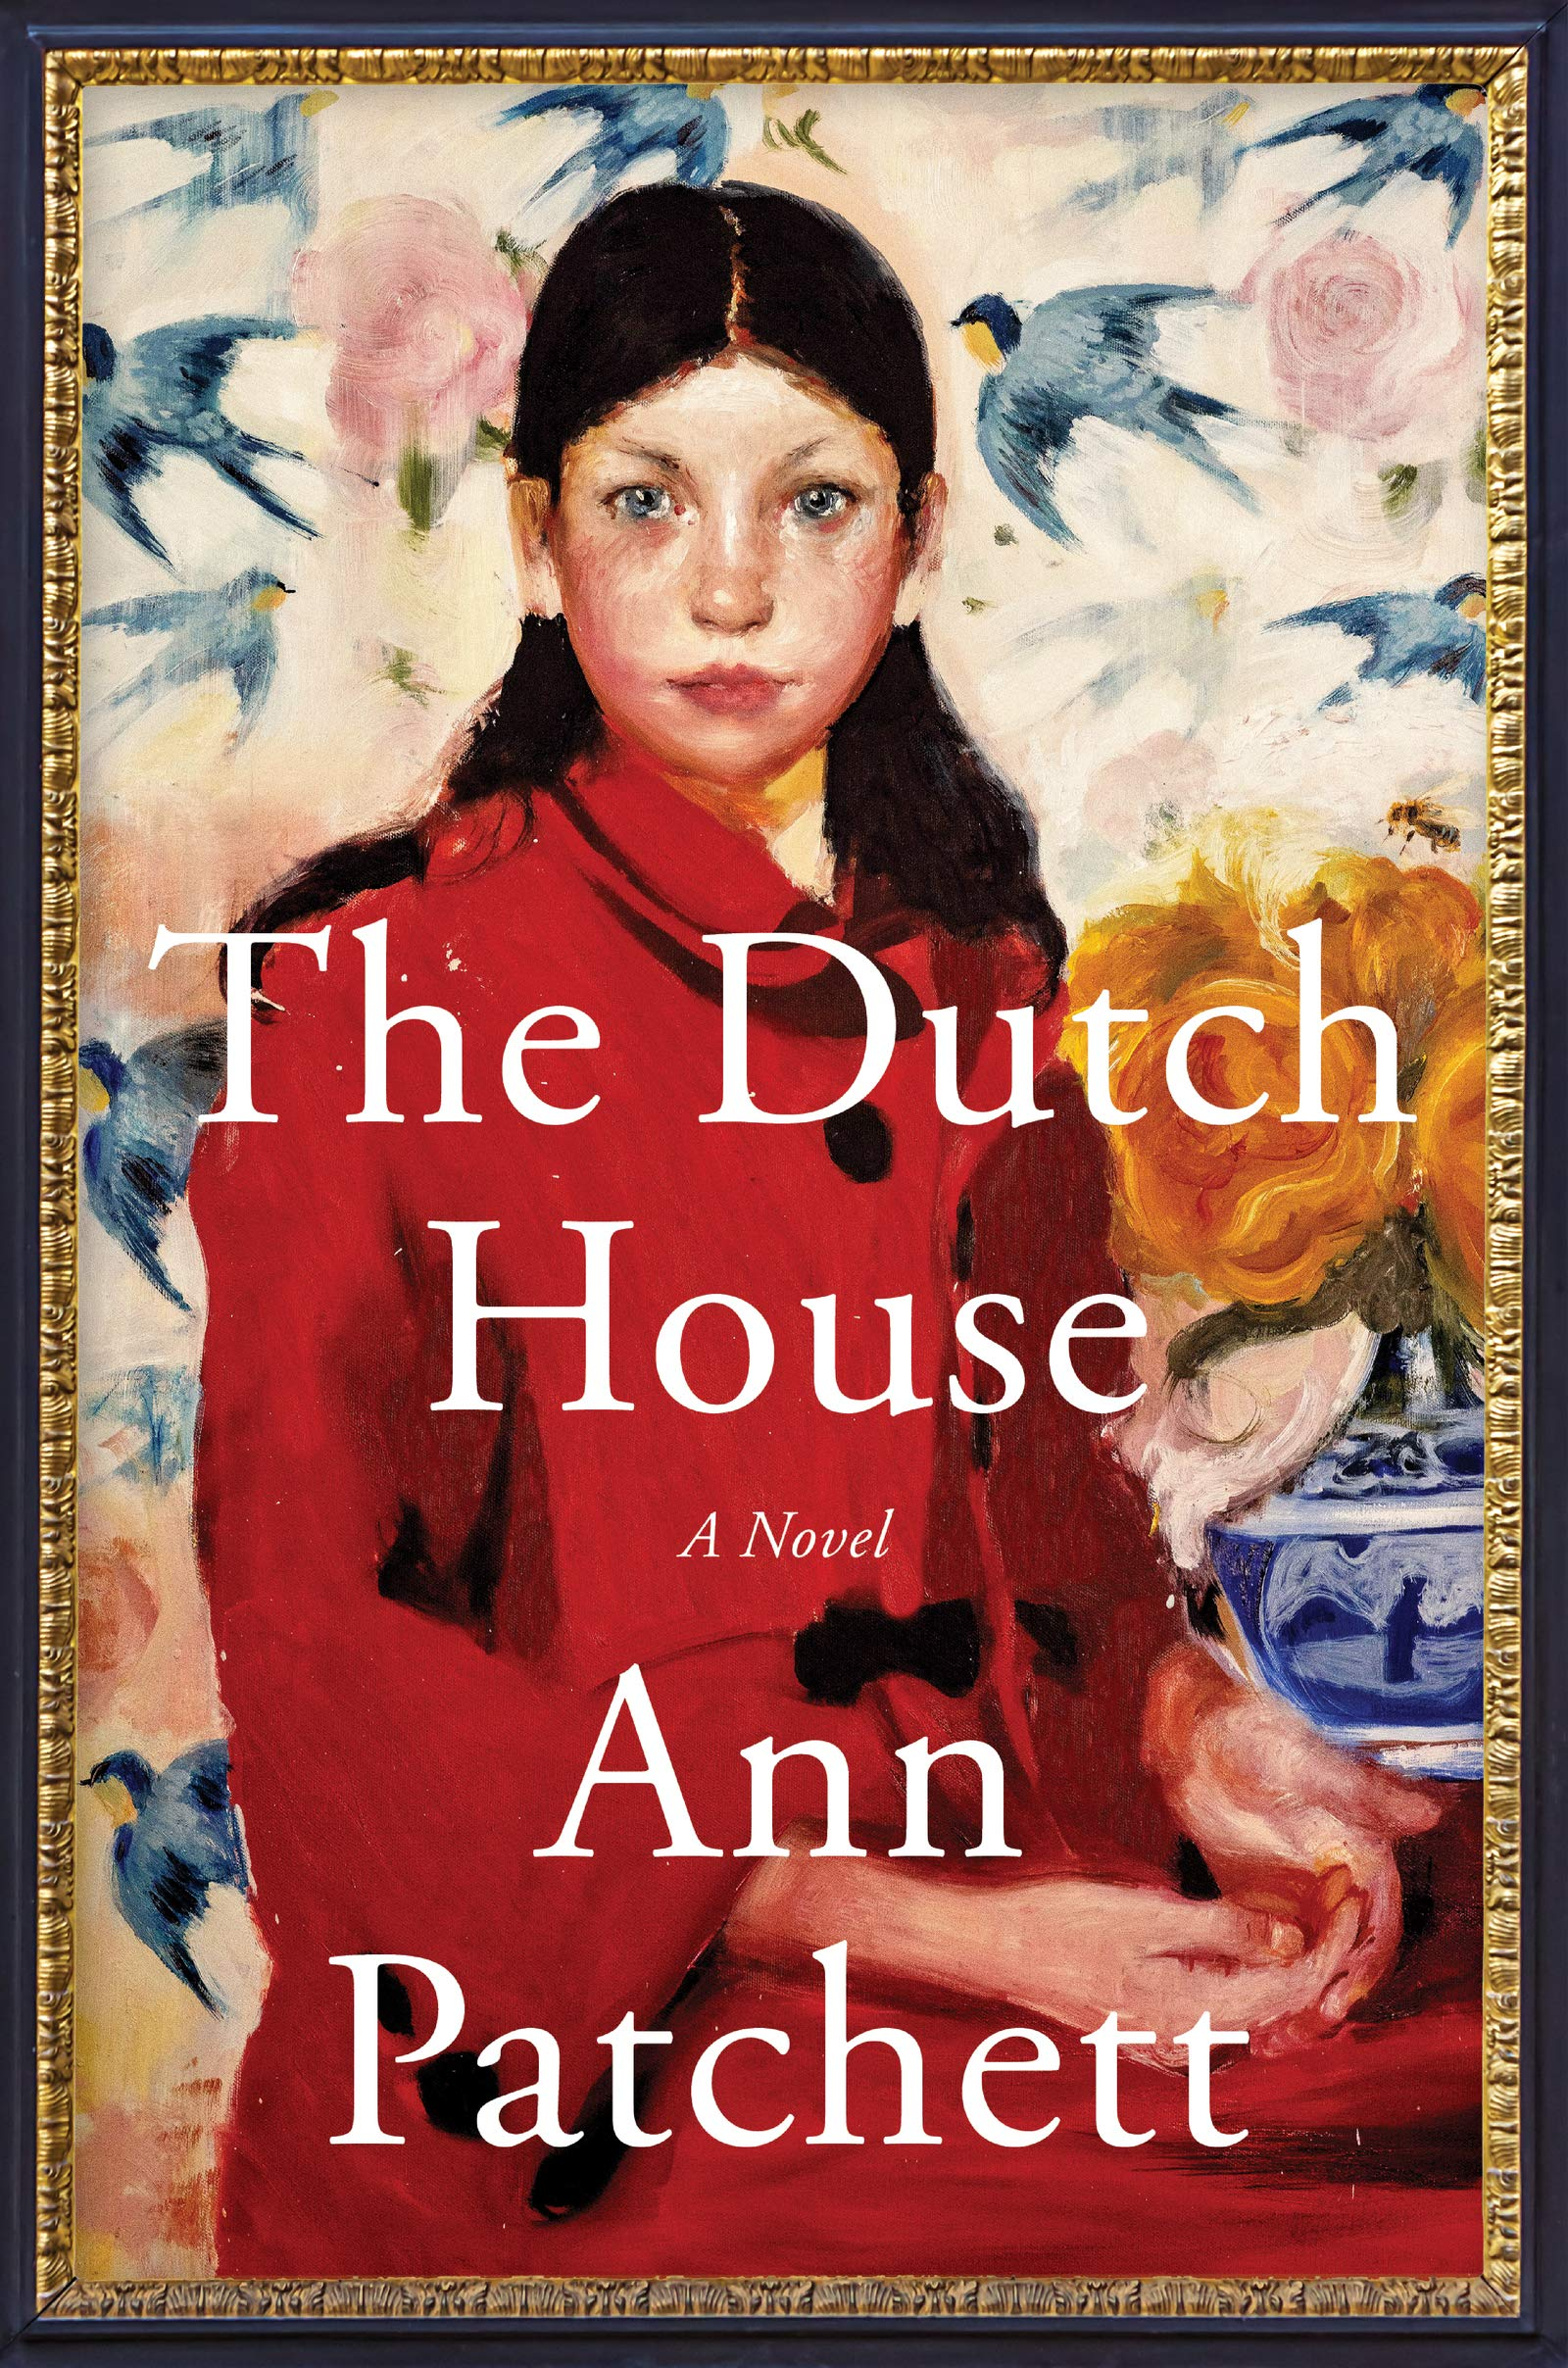 Books I Read in December 2019: The Dutch House by Ann Patchett